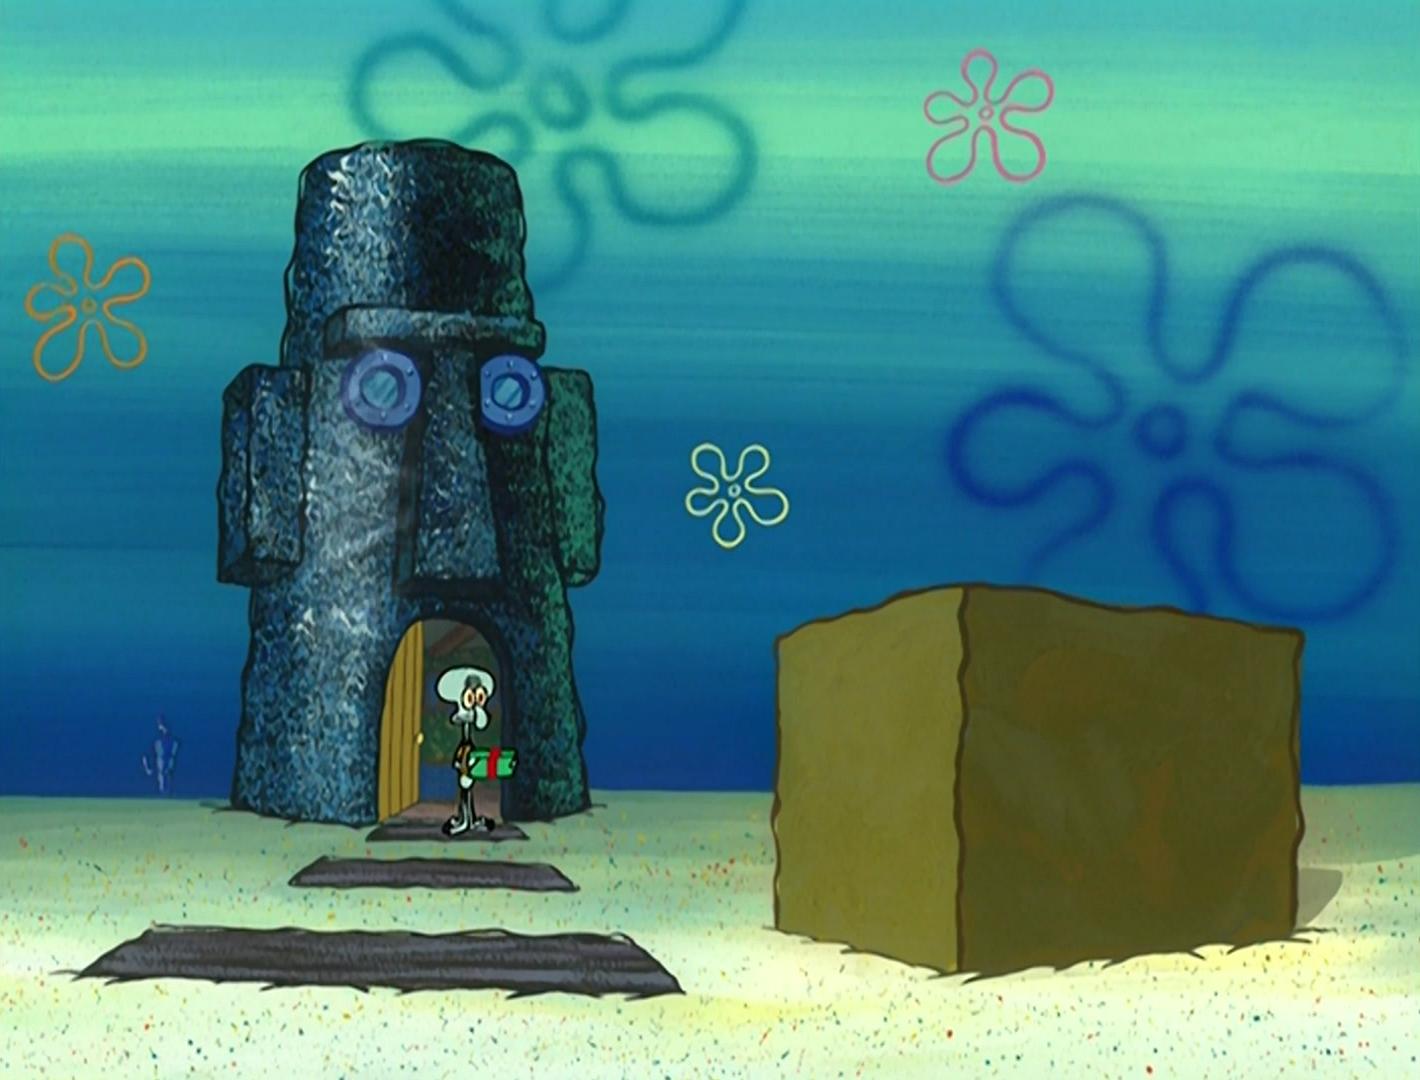 Spongebob Imagination Meme Funny : The list of best funniest spongebob episodes ever